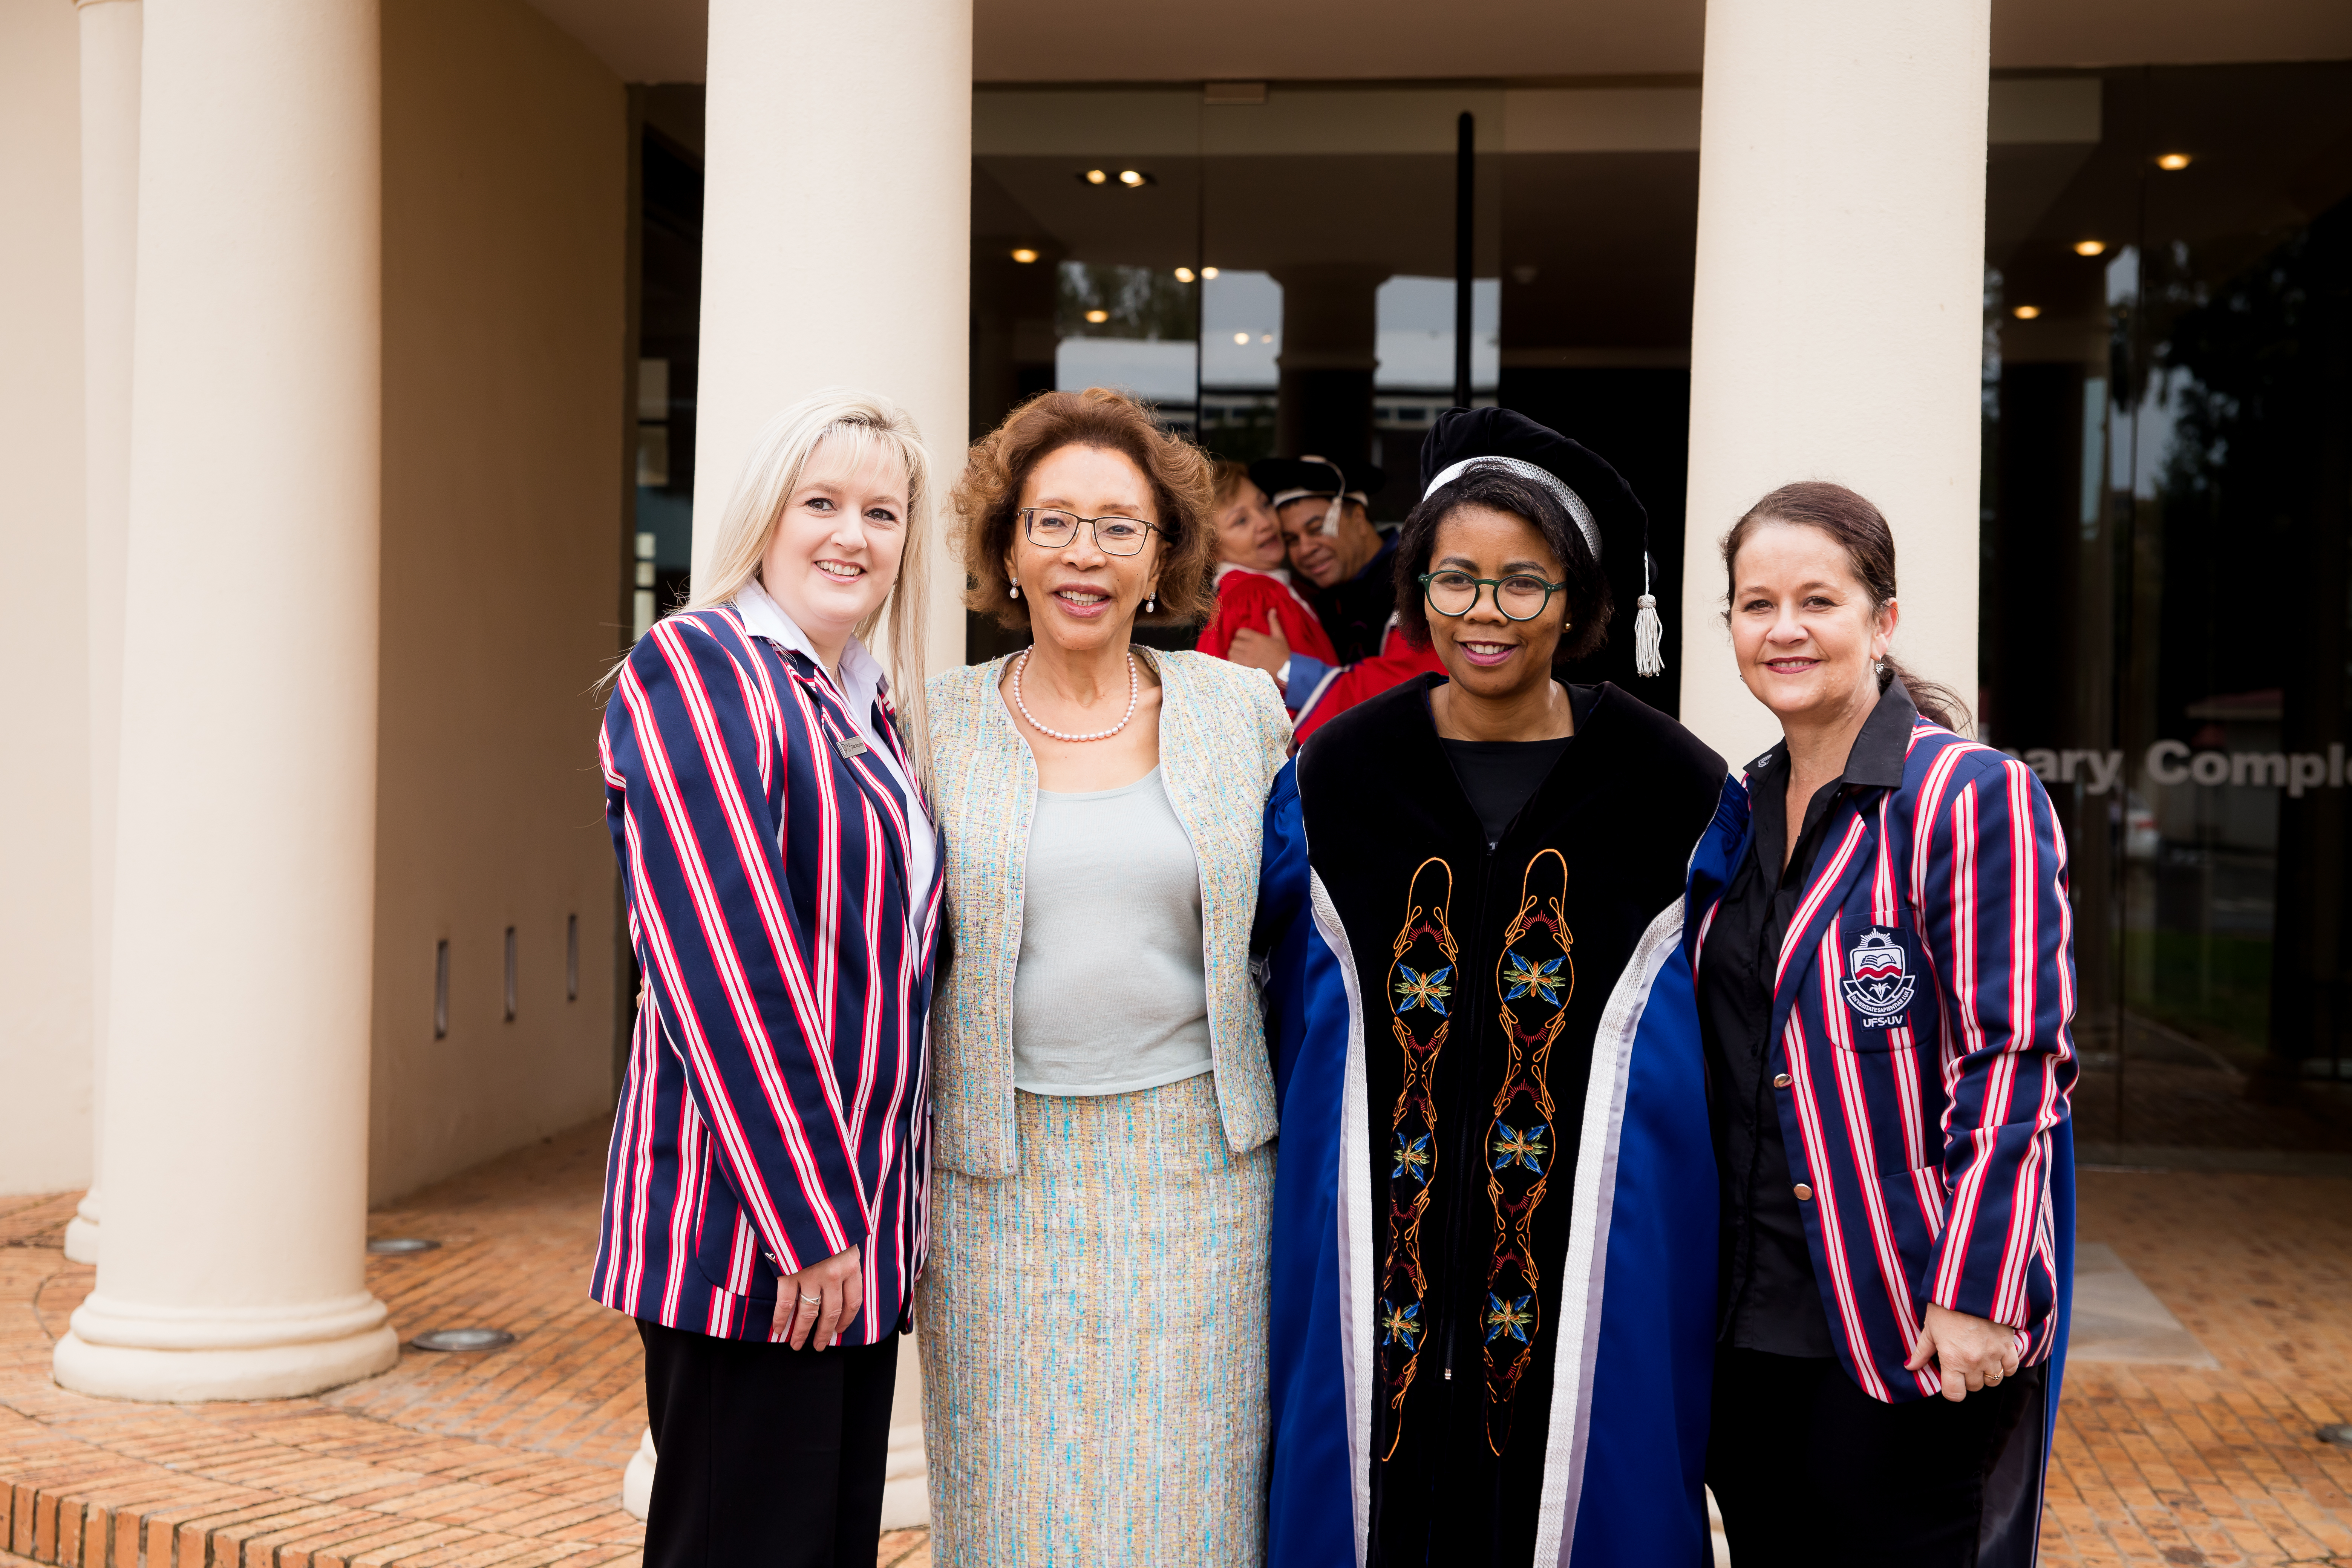 Zita Strydom, Dr Tsepho Motespe and Lacea Loader